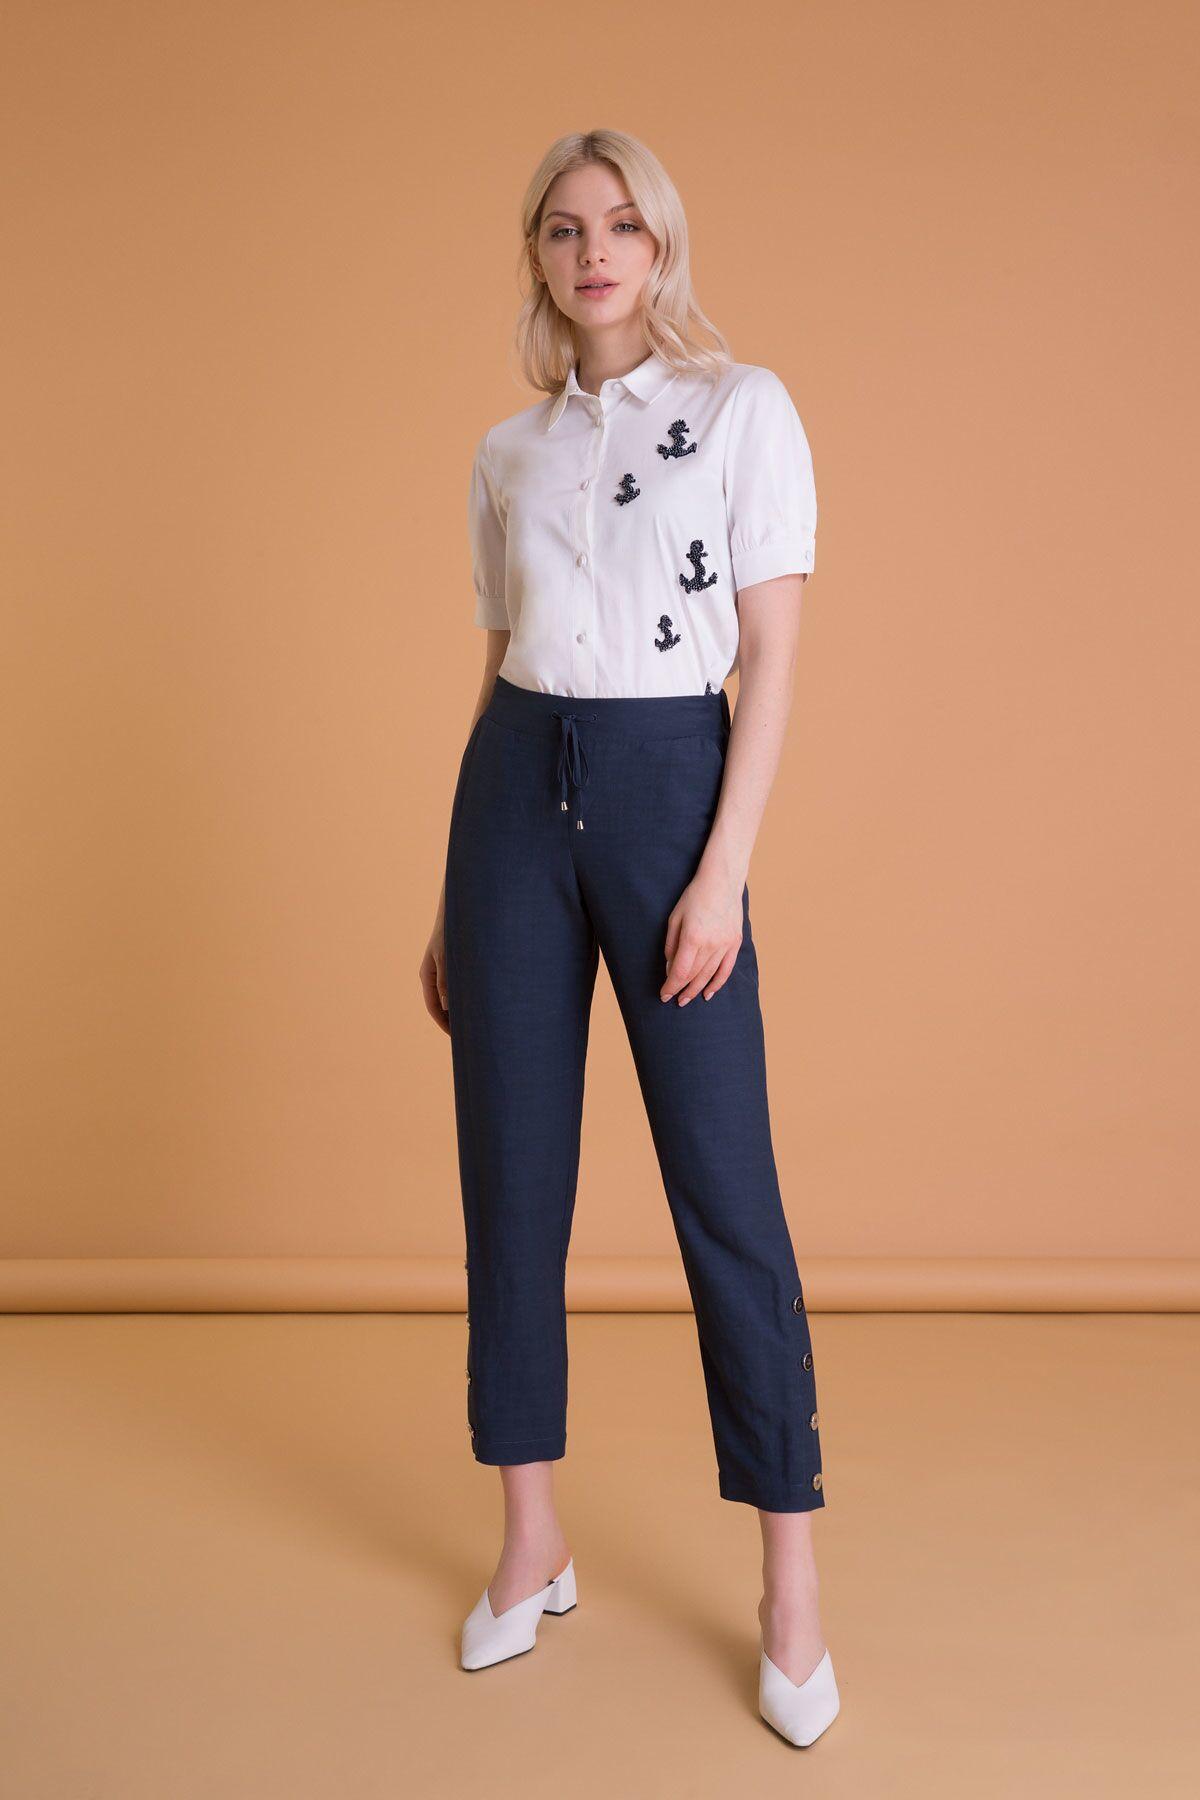 Düz Renk Havuç Pantolon